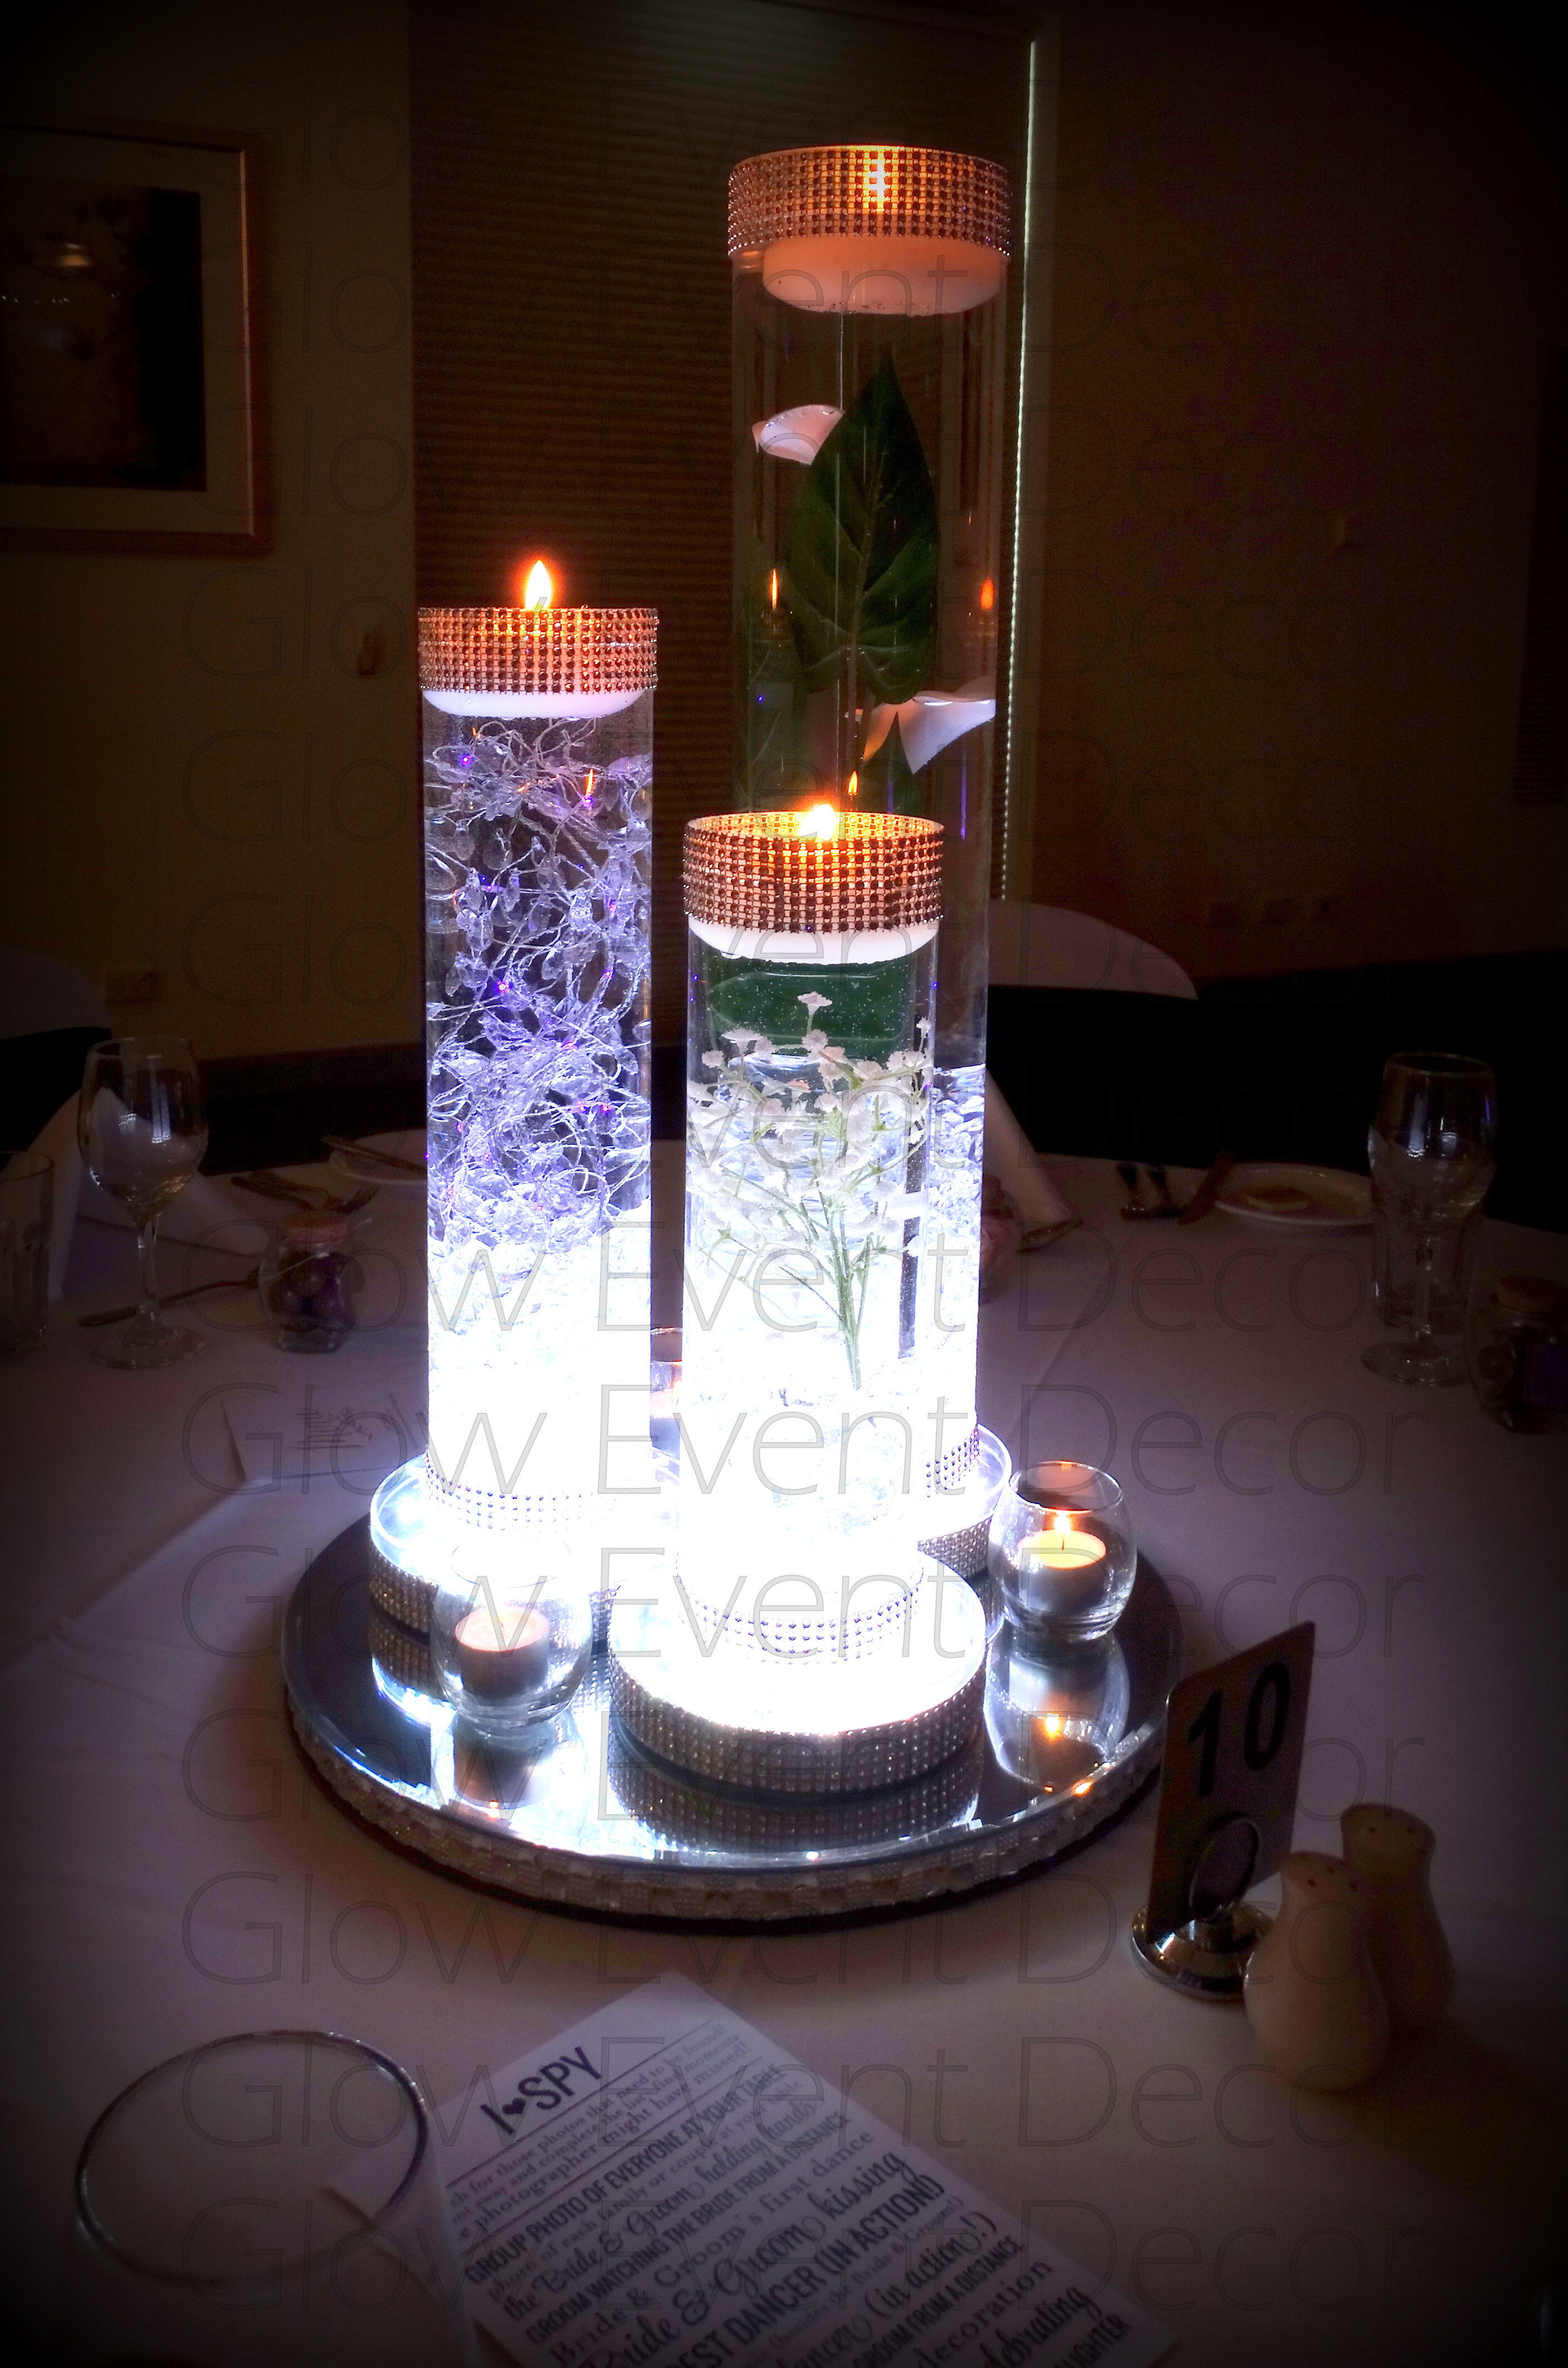 lead crystal vase ebay of vase light base photos 2012 10 12 09 27 47h vases light up flower within vase light base images led orchid cylinder vase of vase light base photos 2012 10 12